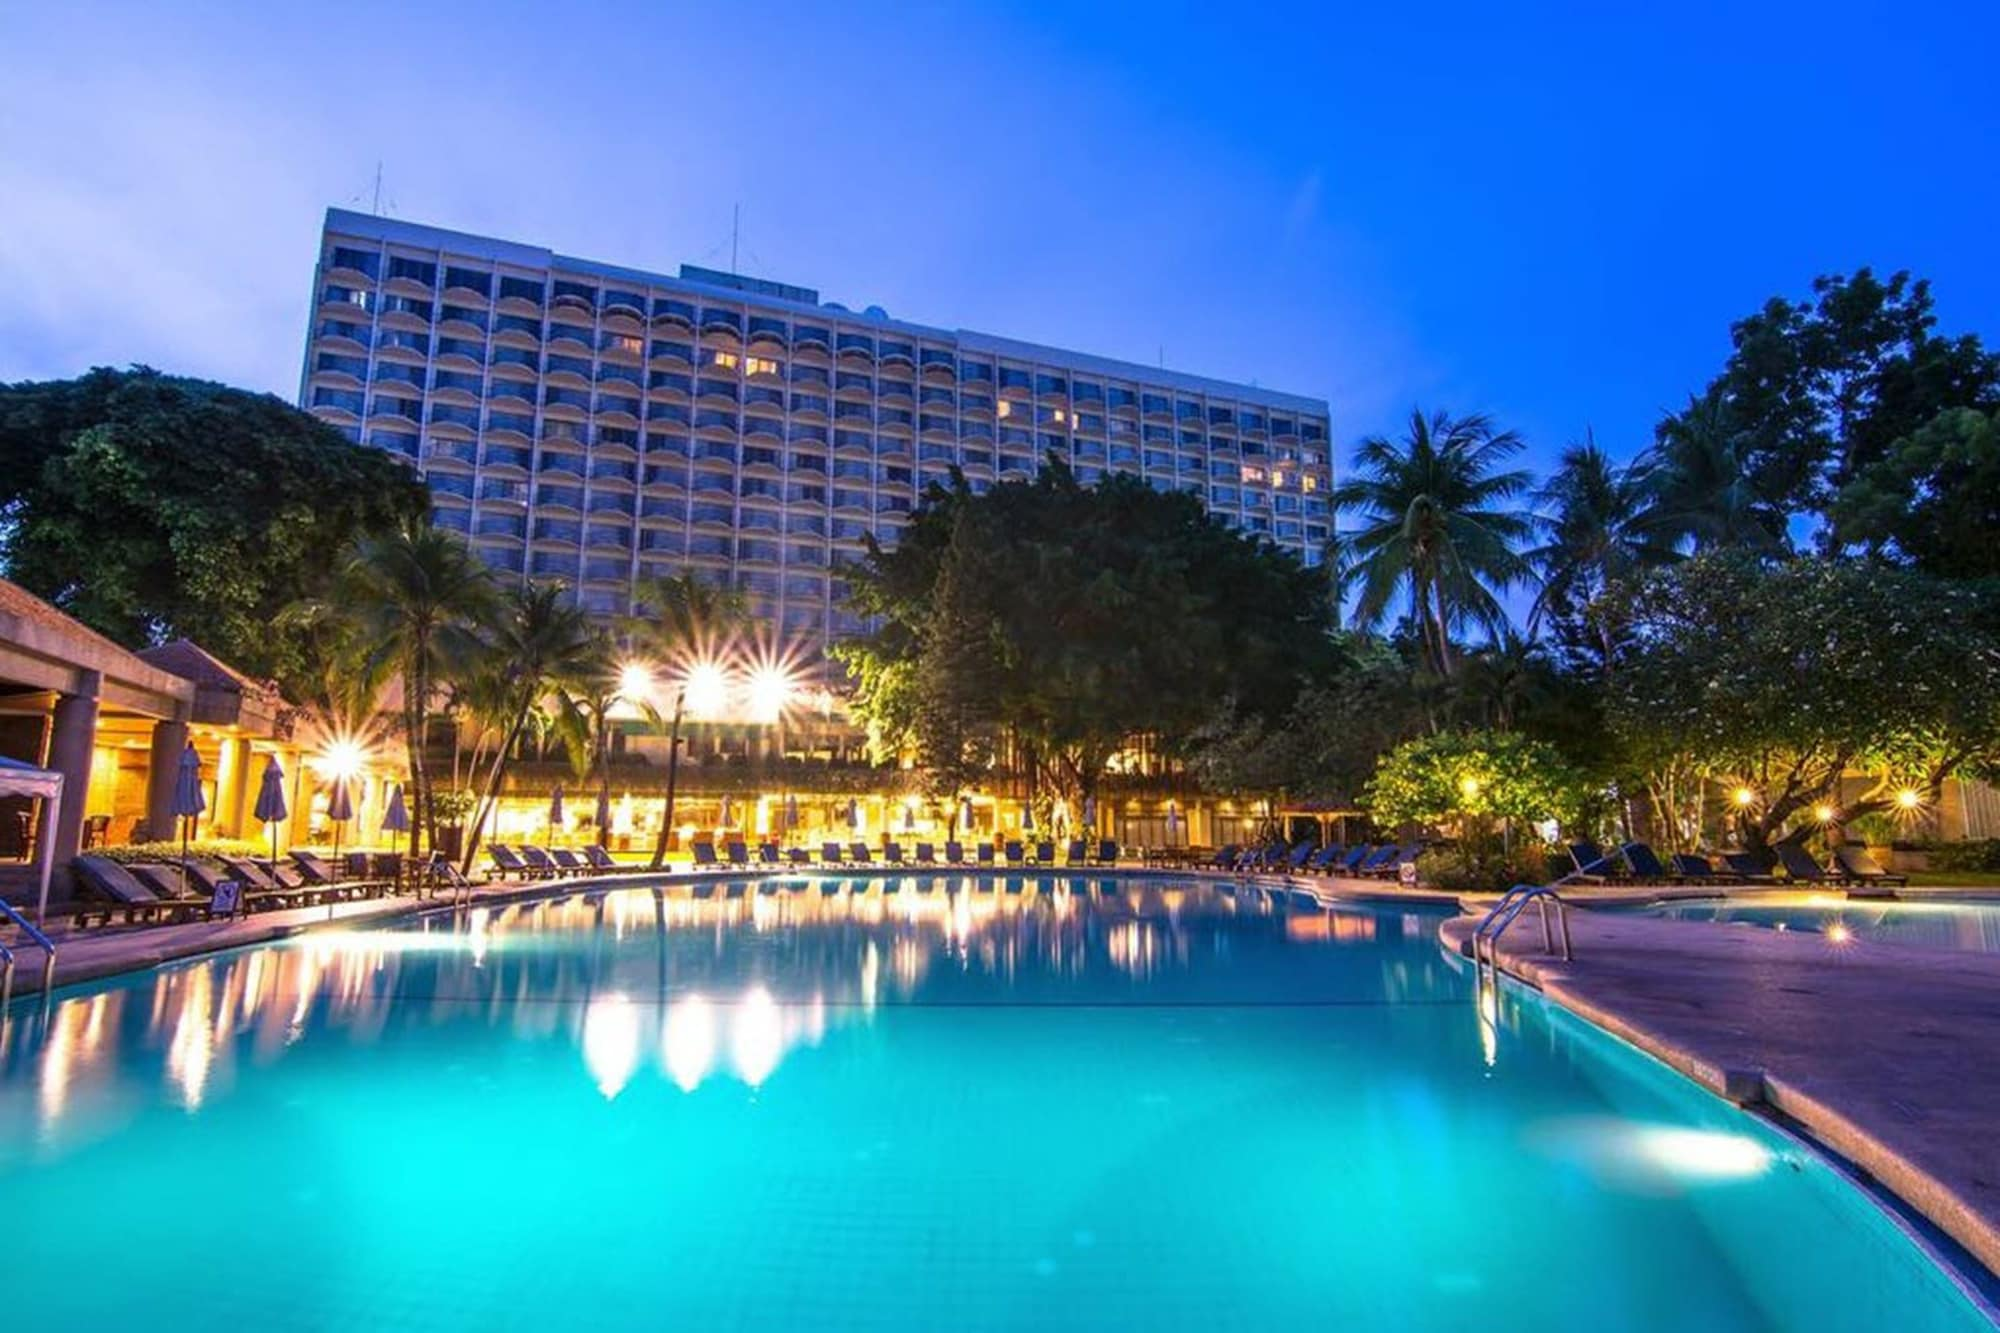 The Imperial Pattaya Hotel, Pattaya